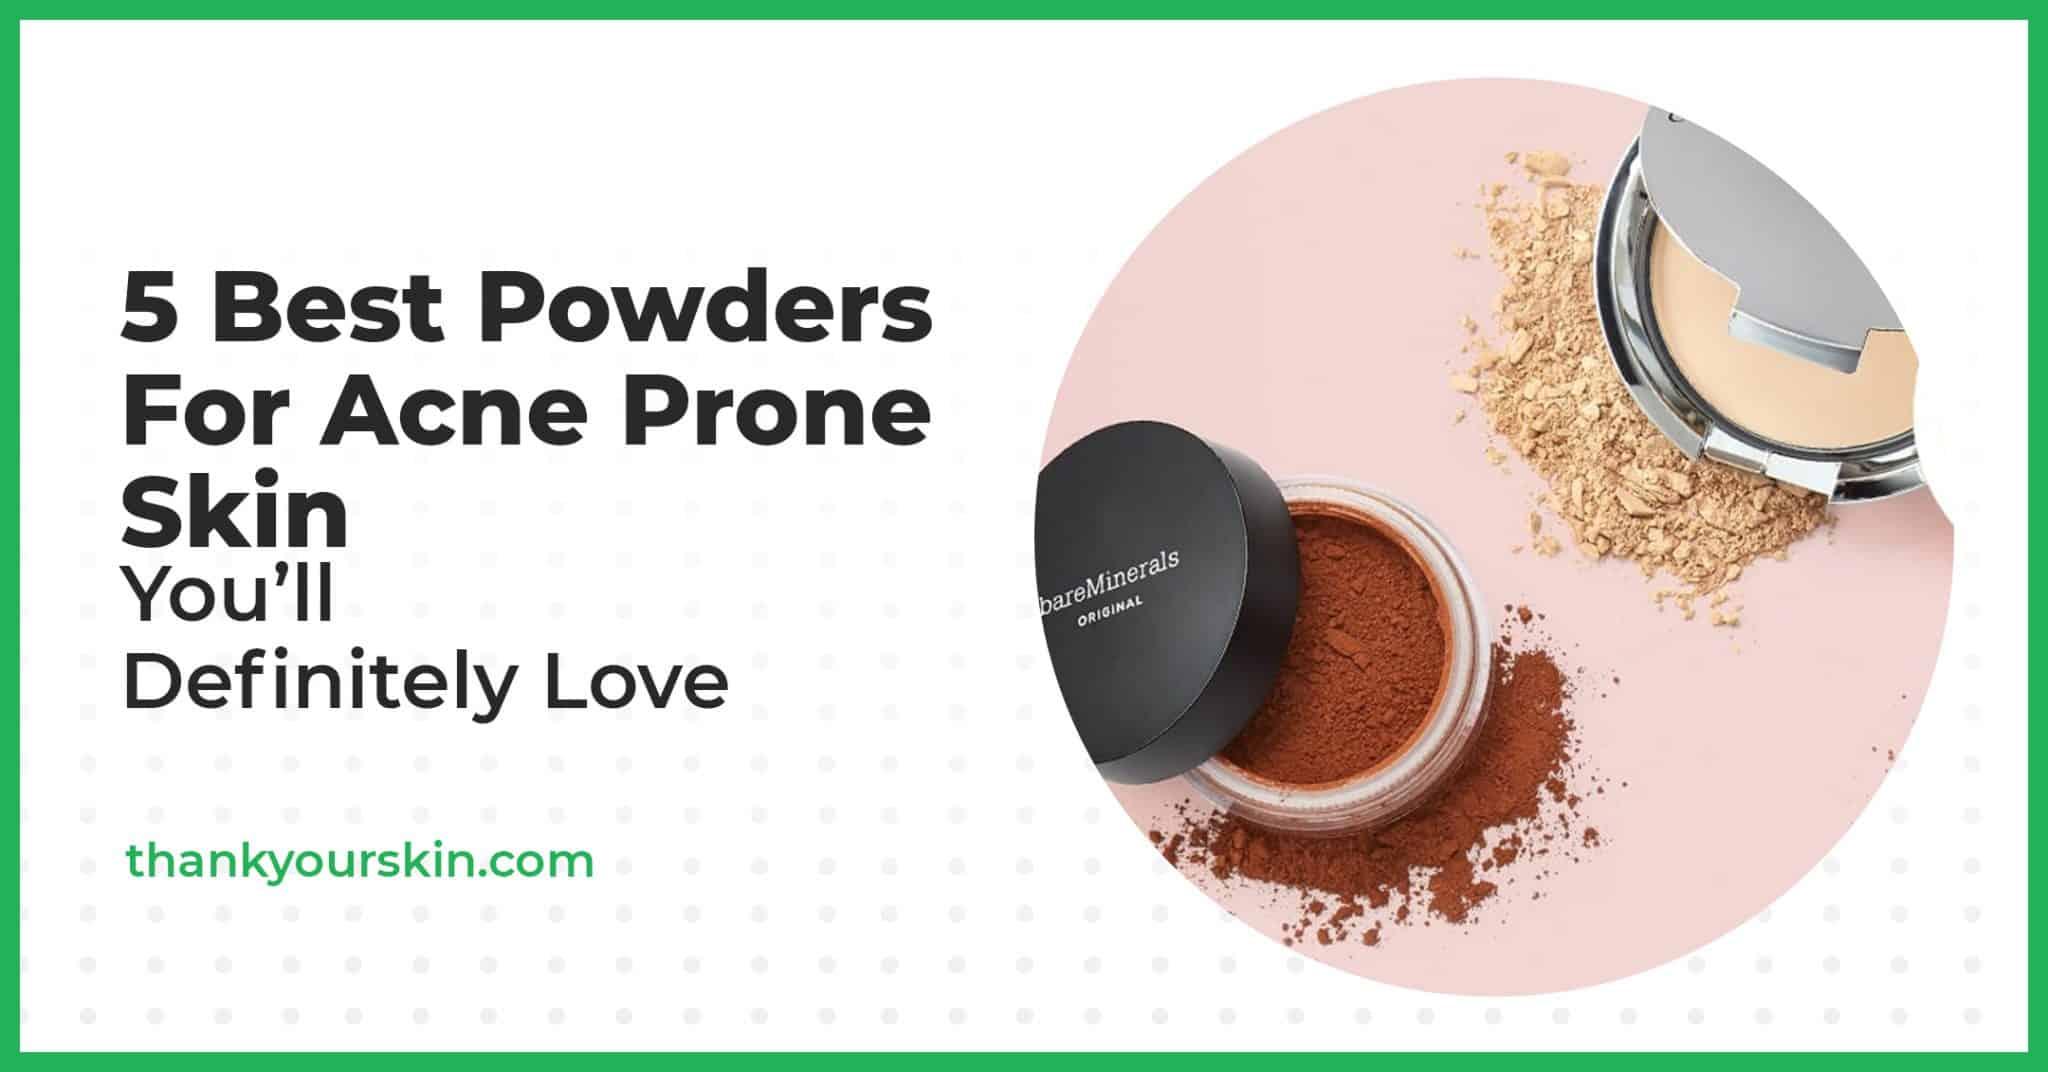 5 Best Powders For Acne Prone Skin You'll Definitely Love